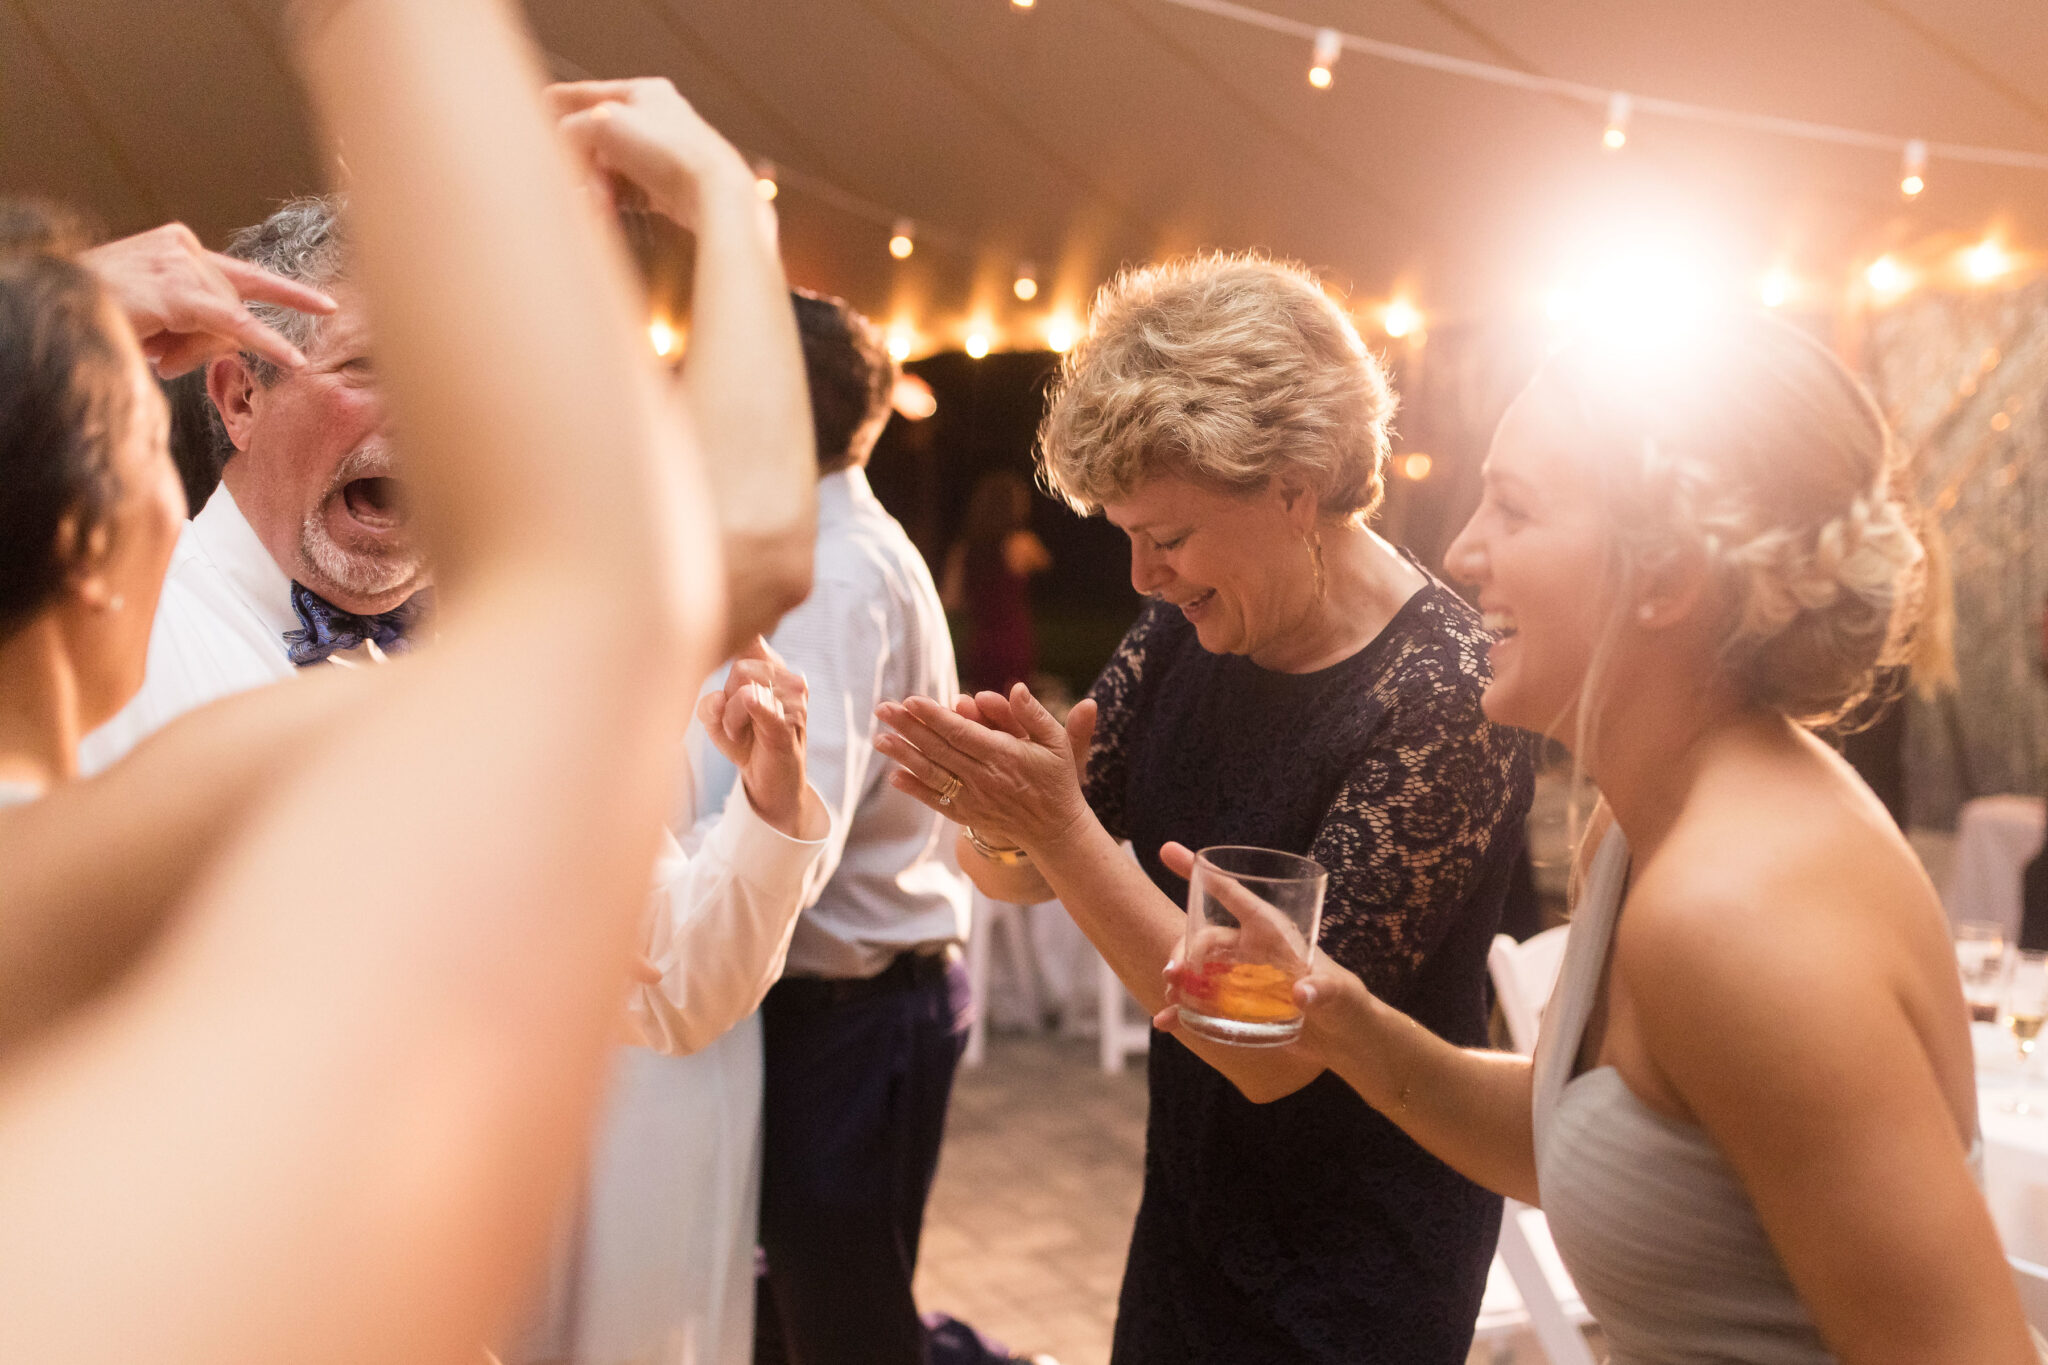 katie-alex-wedding-reception-dancing-249